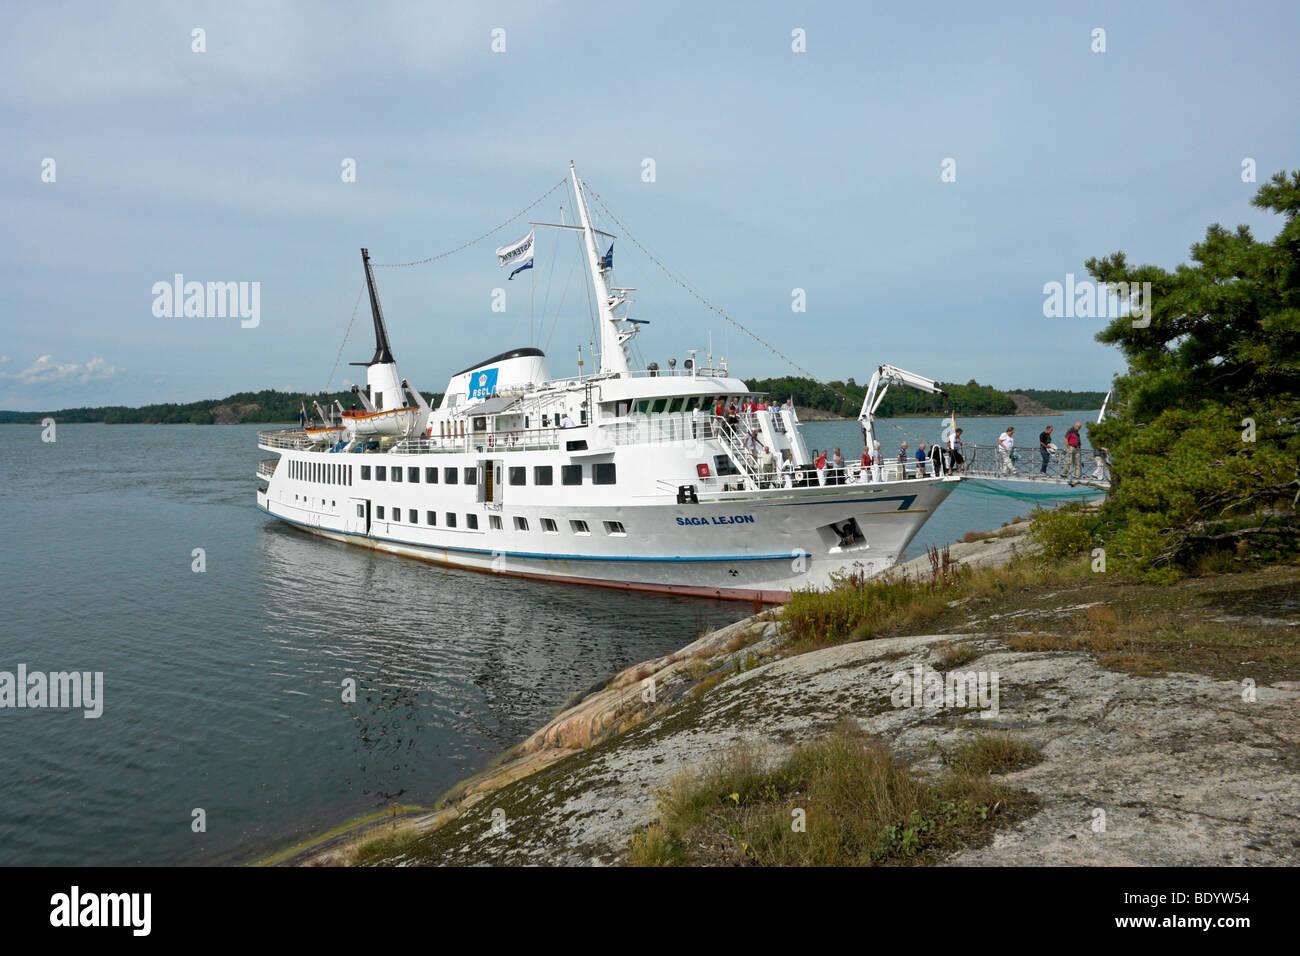 The Swedish archipelago cruise ship Saga Lejon disembarks passengers via her bow at Swedish archipelago Island - Stock Image